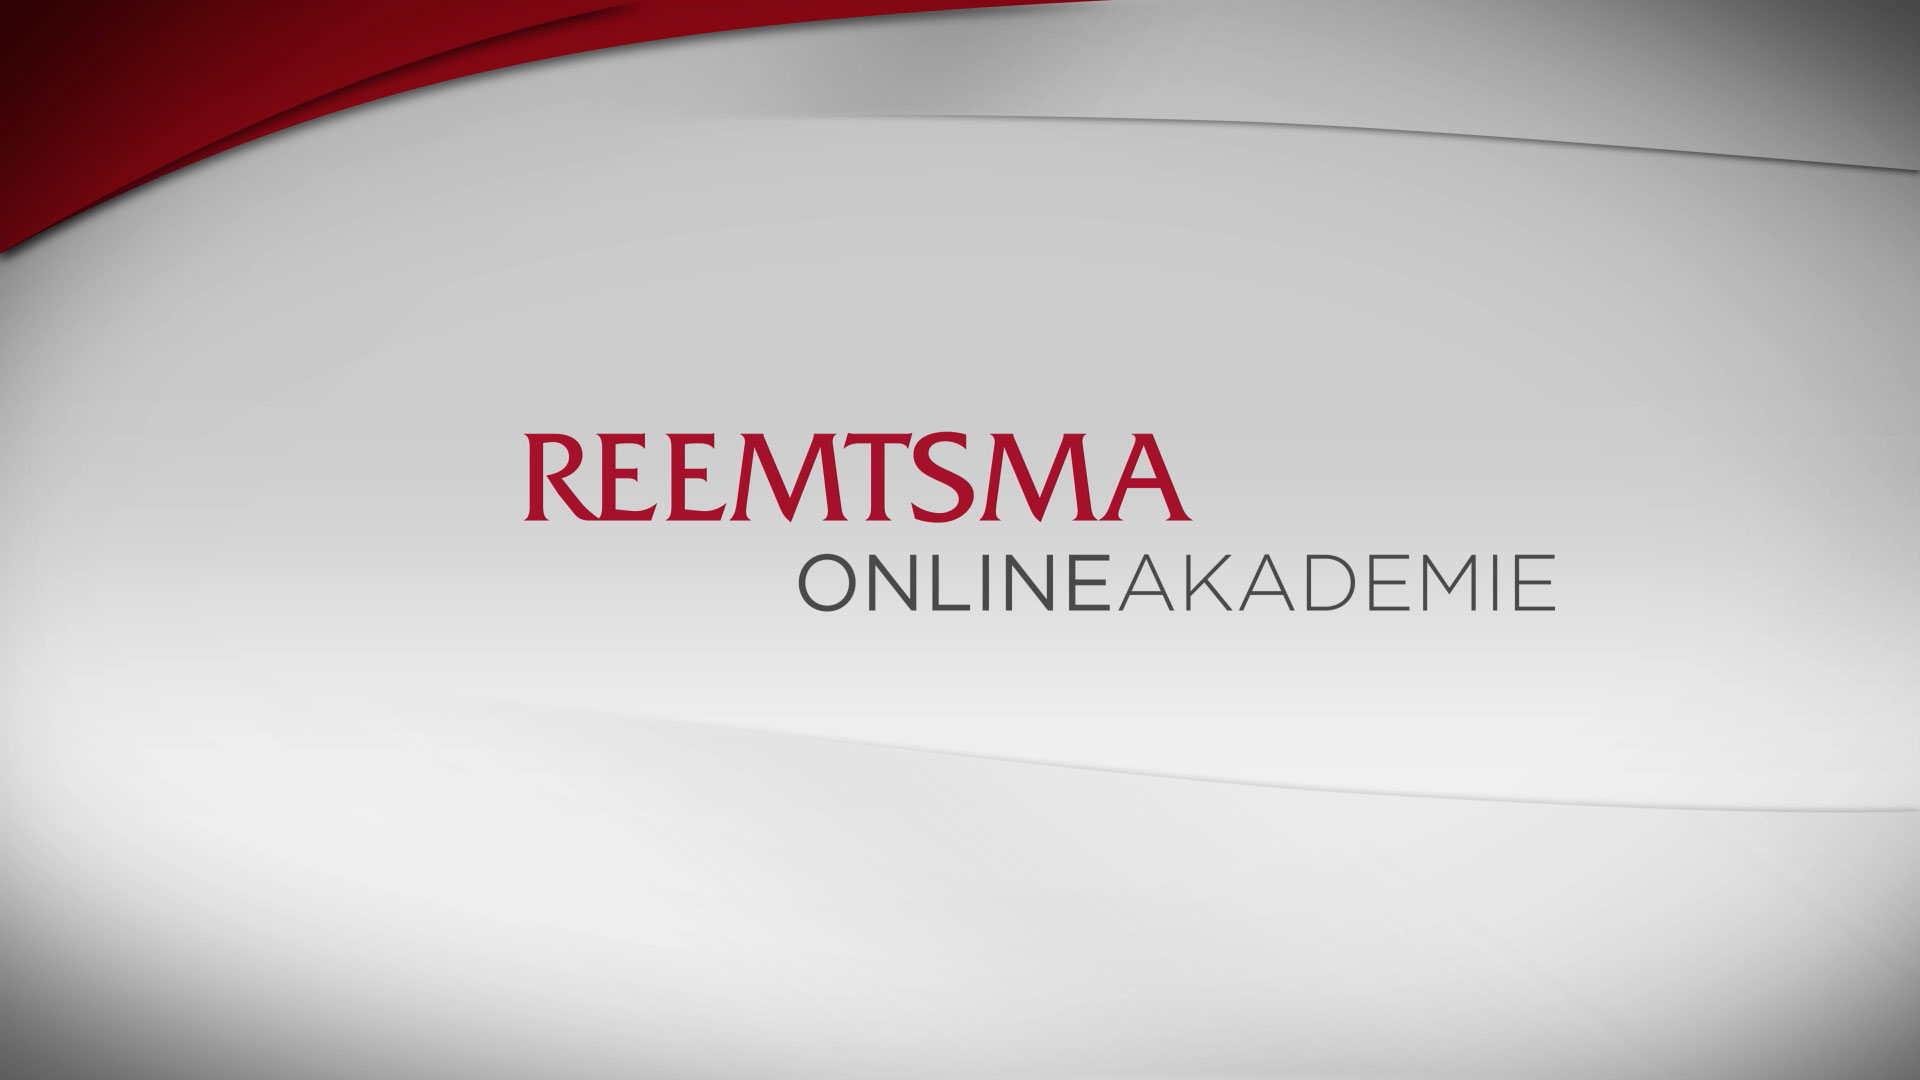 TV Magazin Serie Reemtsma Online Akademie | 3motion GmbH